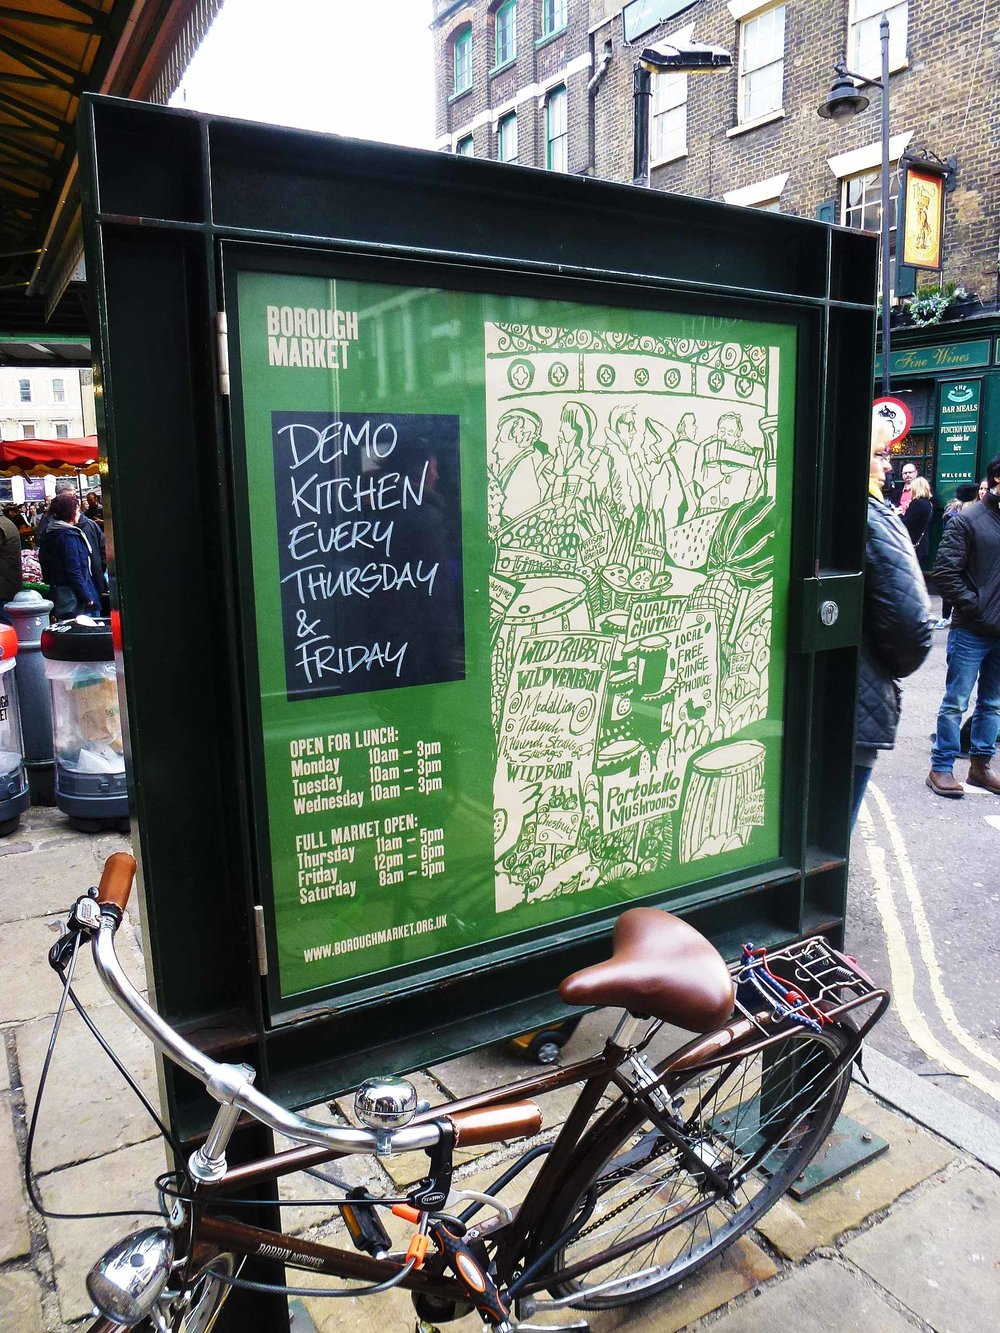 Borough-Market-demo-kitchen-poster.jpg